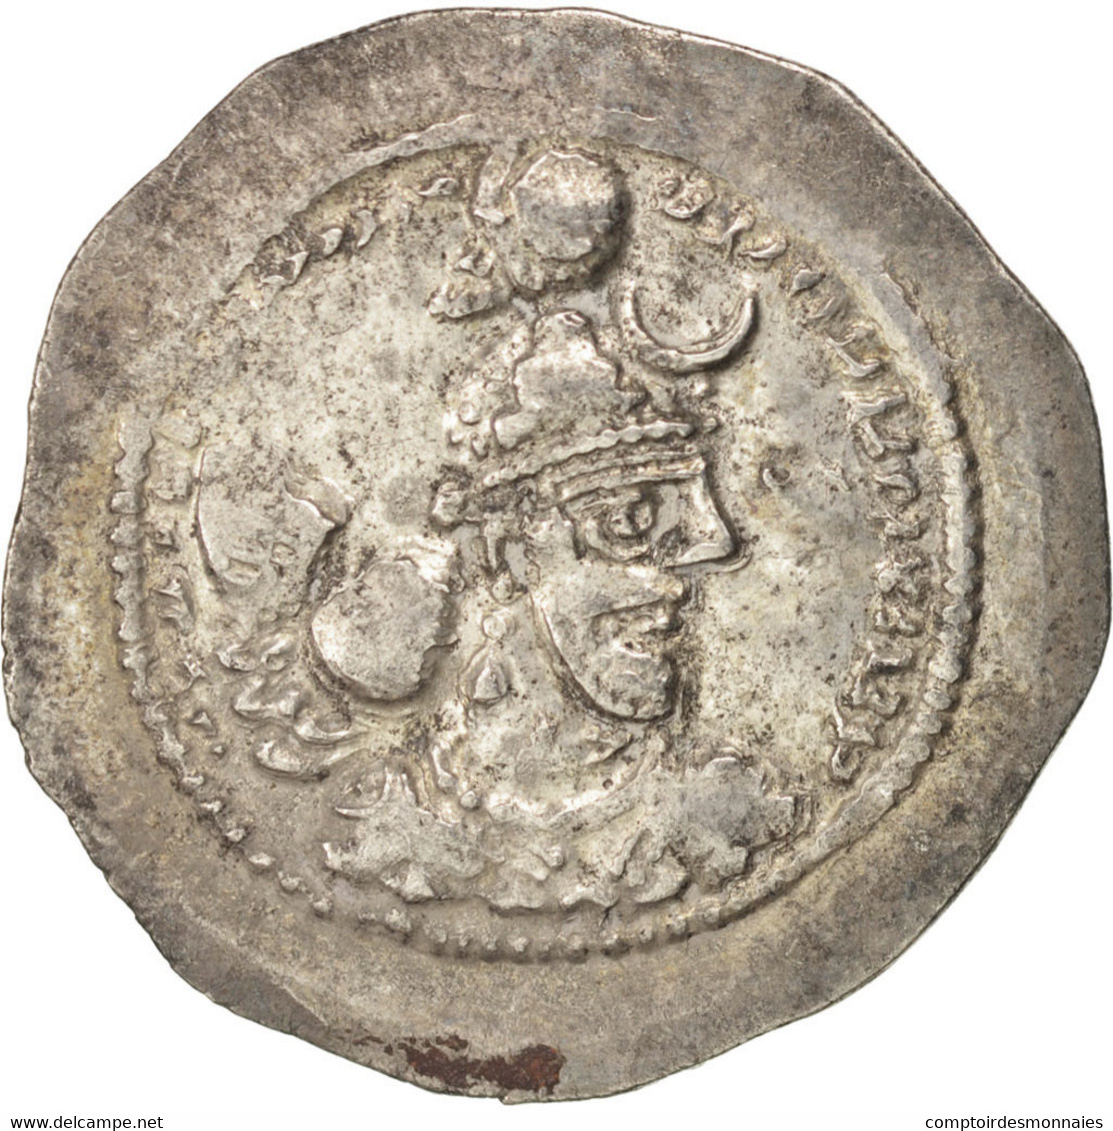 Sassanides, Yazdgard Ier (390-420), Drachme, Göbl 147 - Orientales